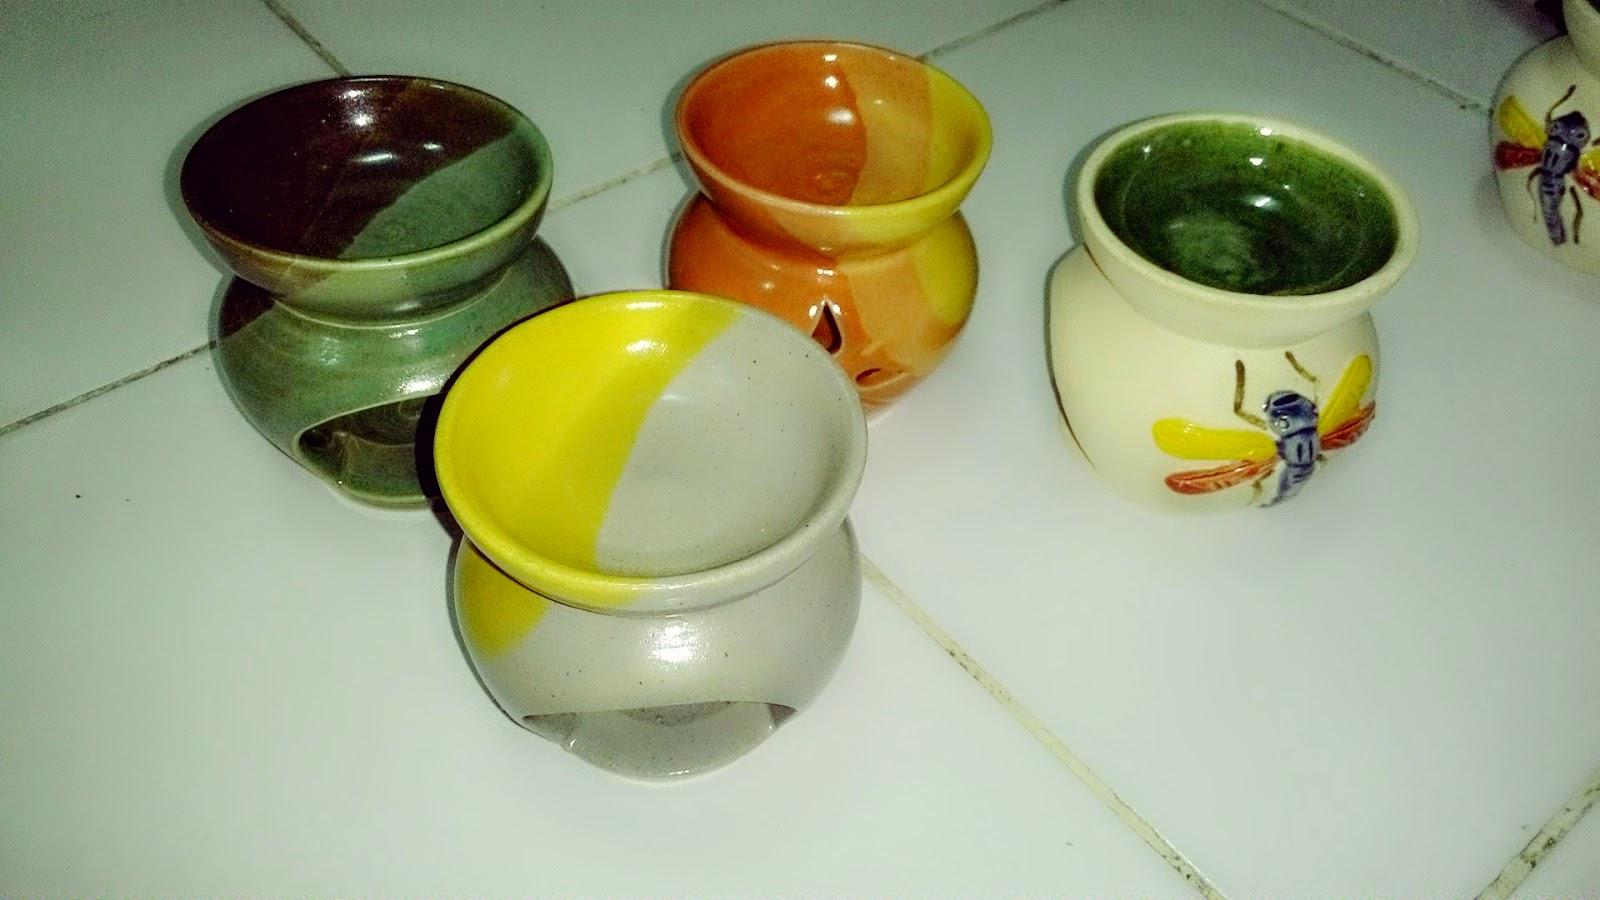 Candle holder ceramic burner aromatherapy